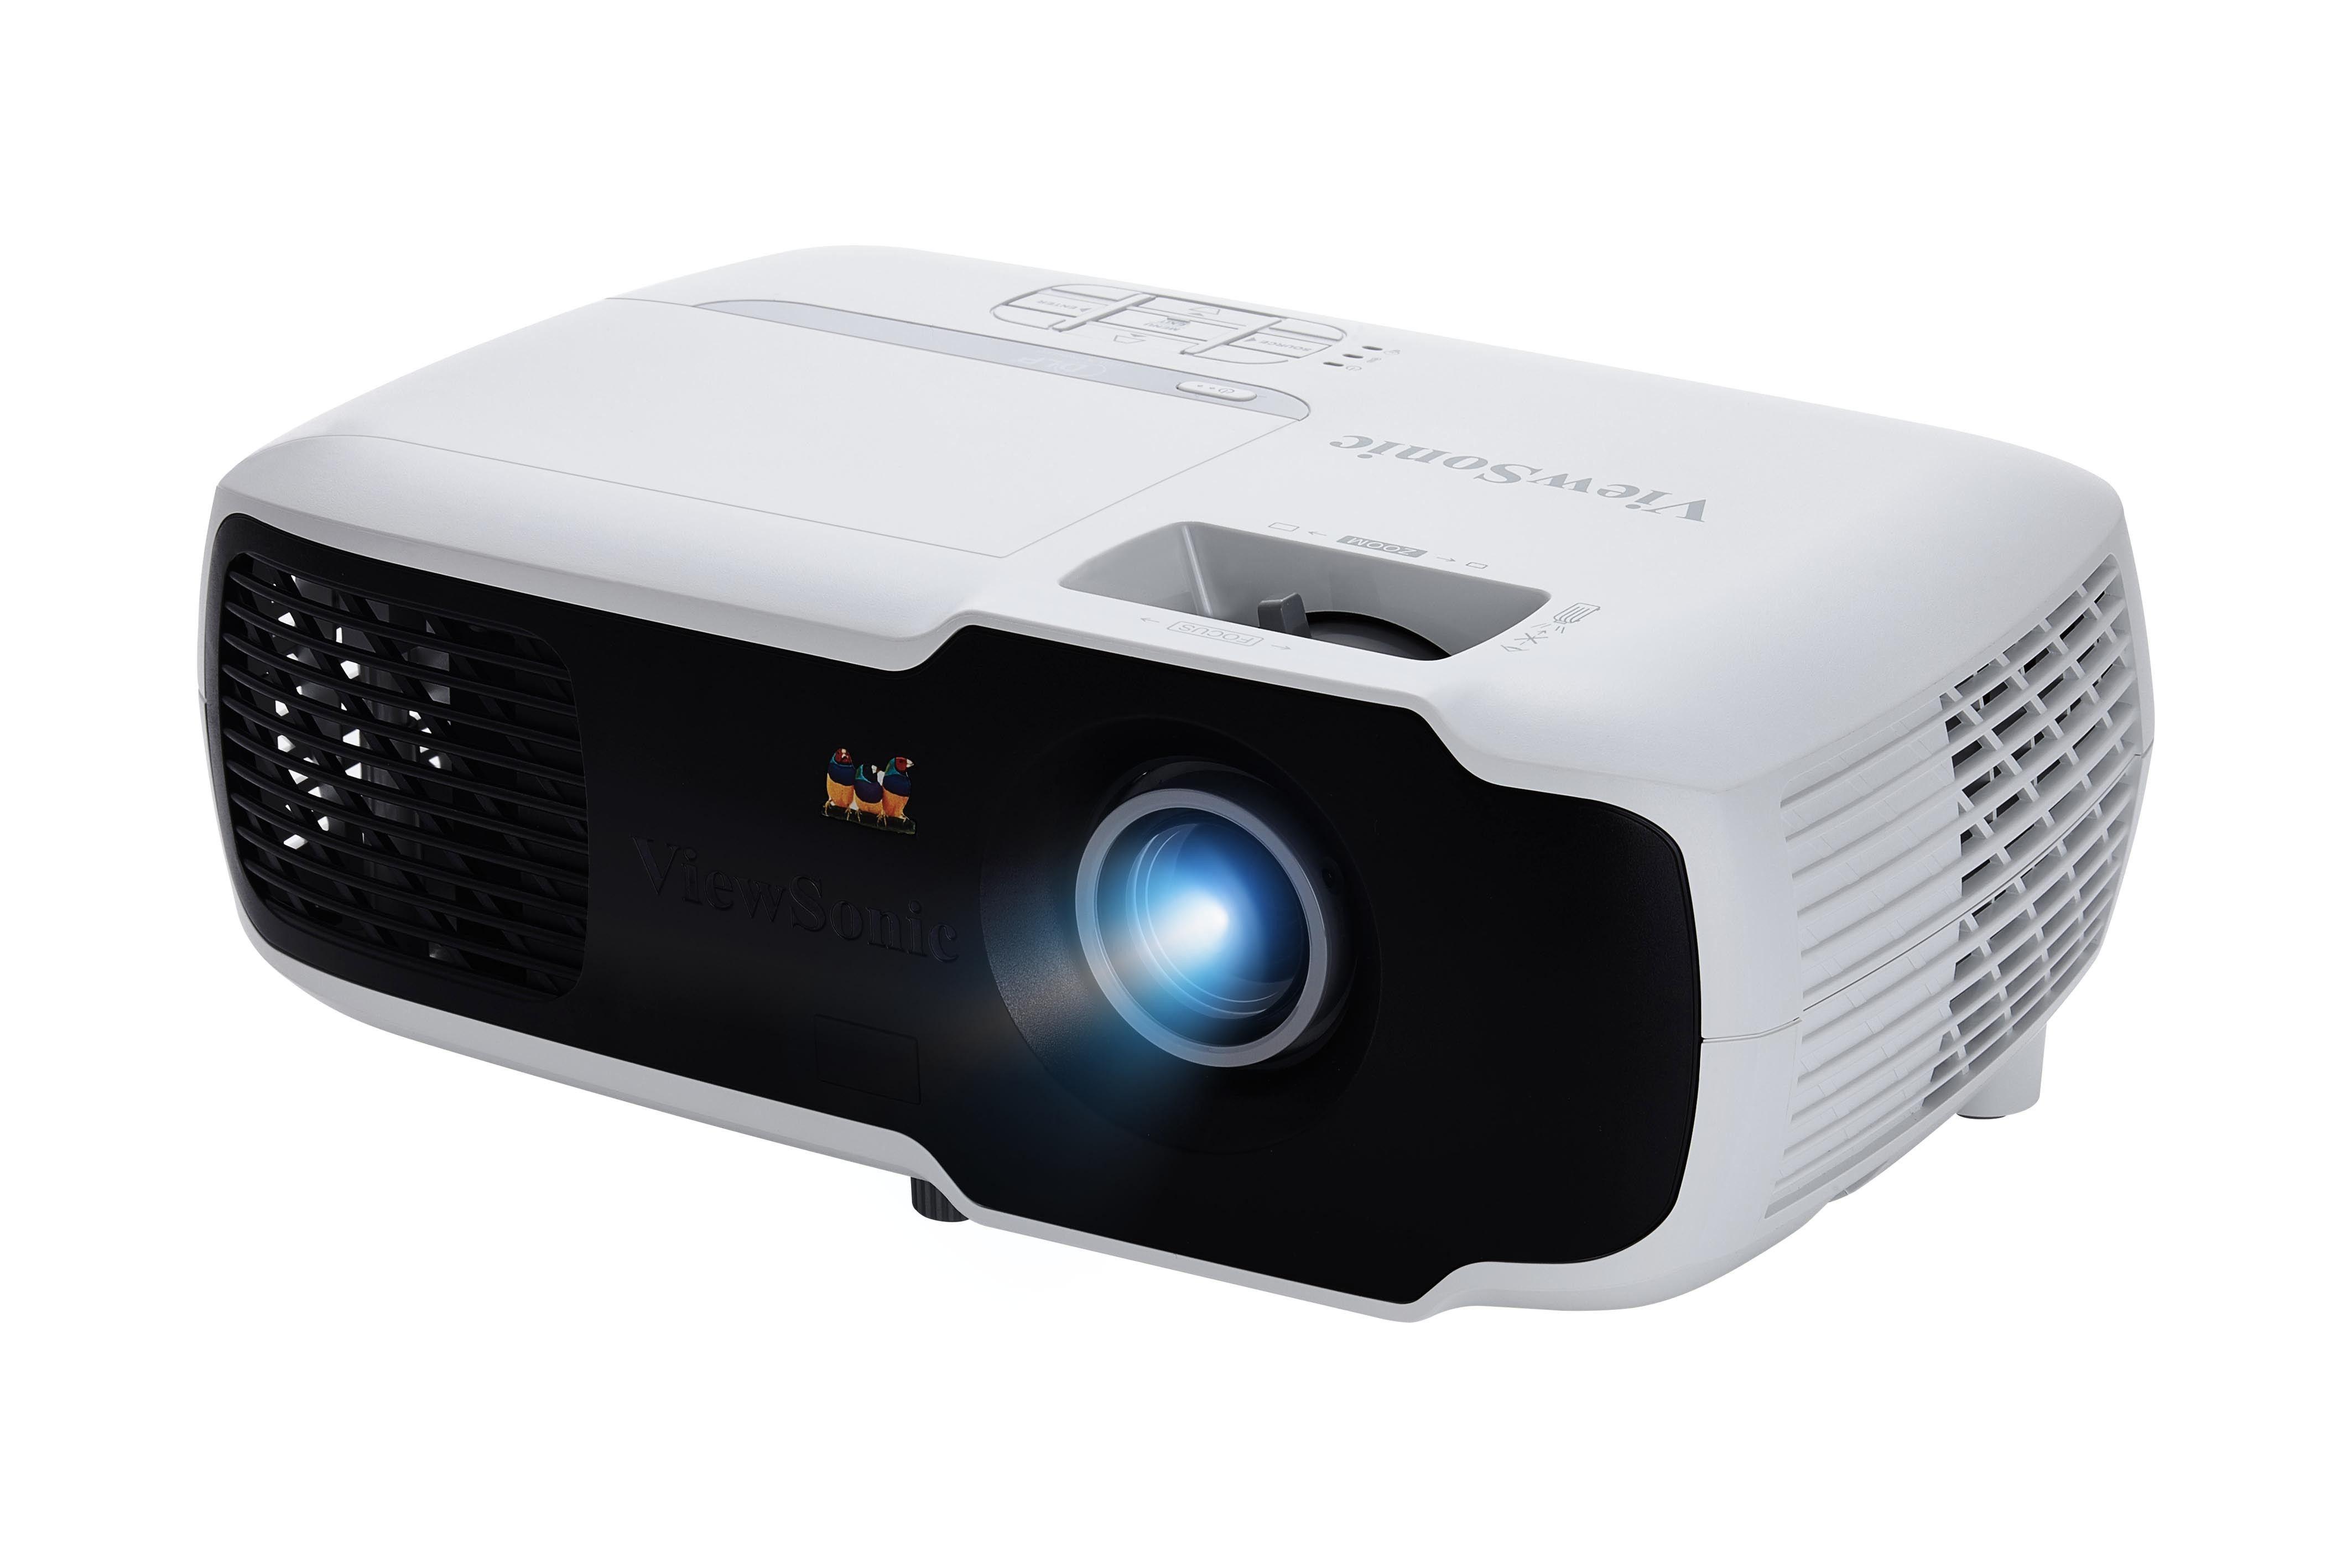 Vidéoprojecteur SVGA DLP 3500 lumens